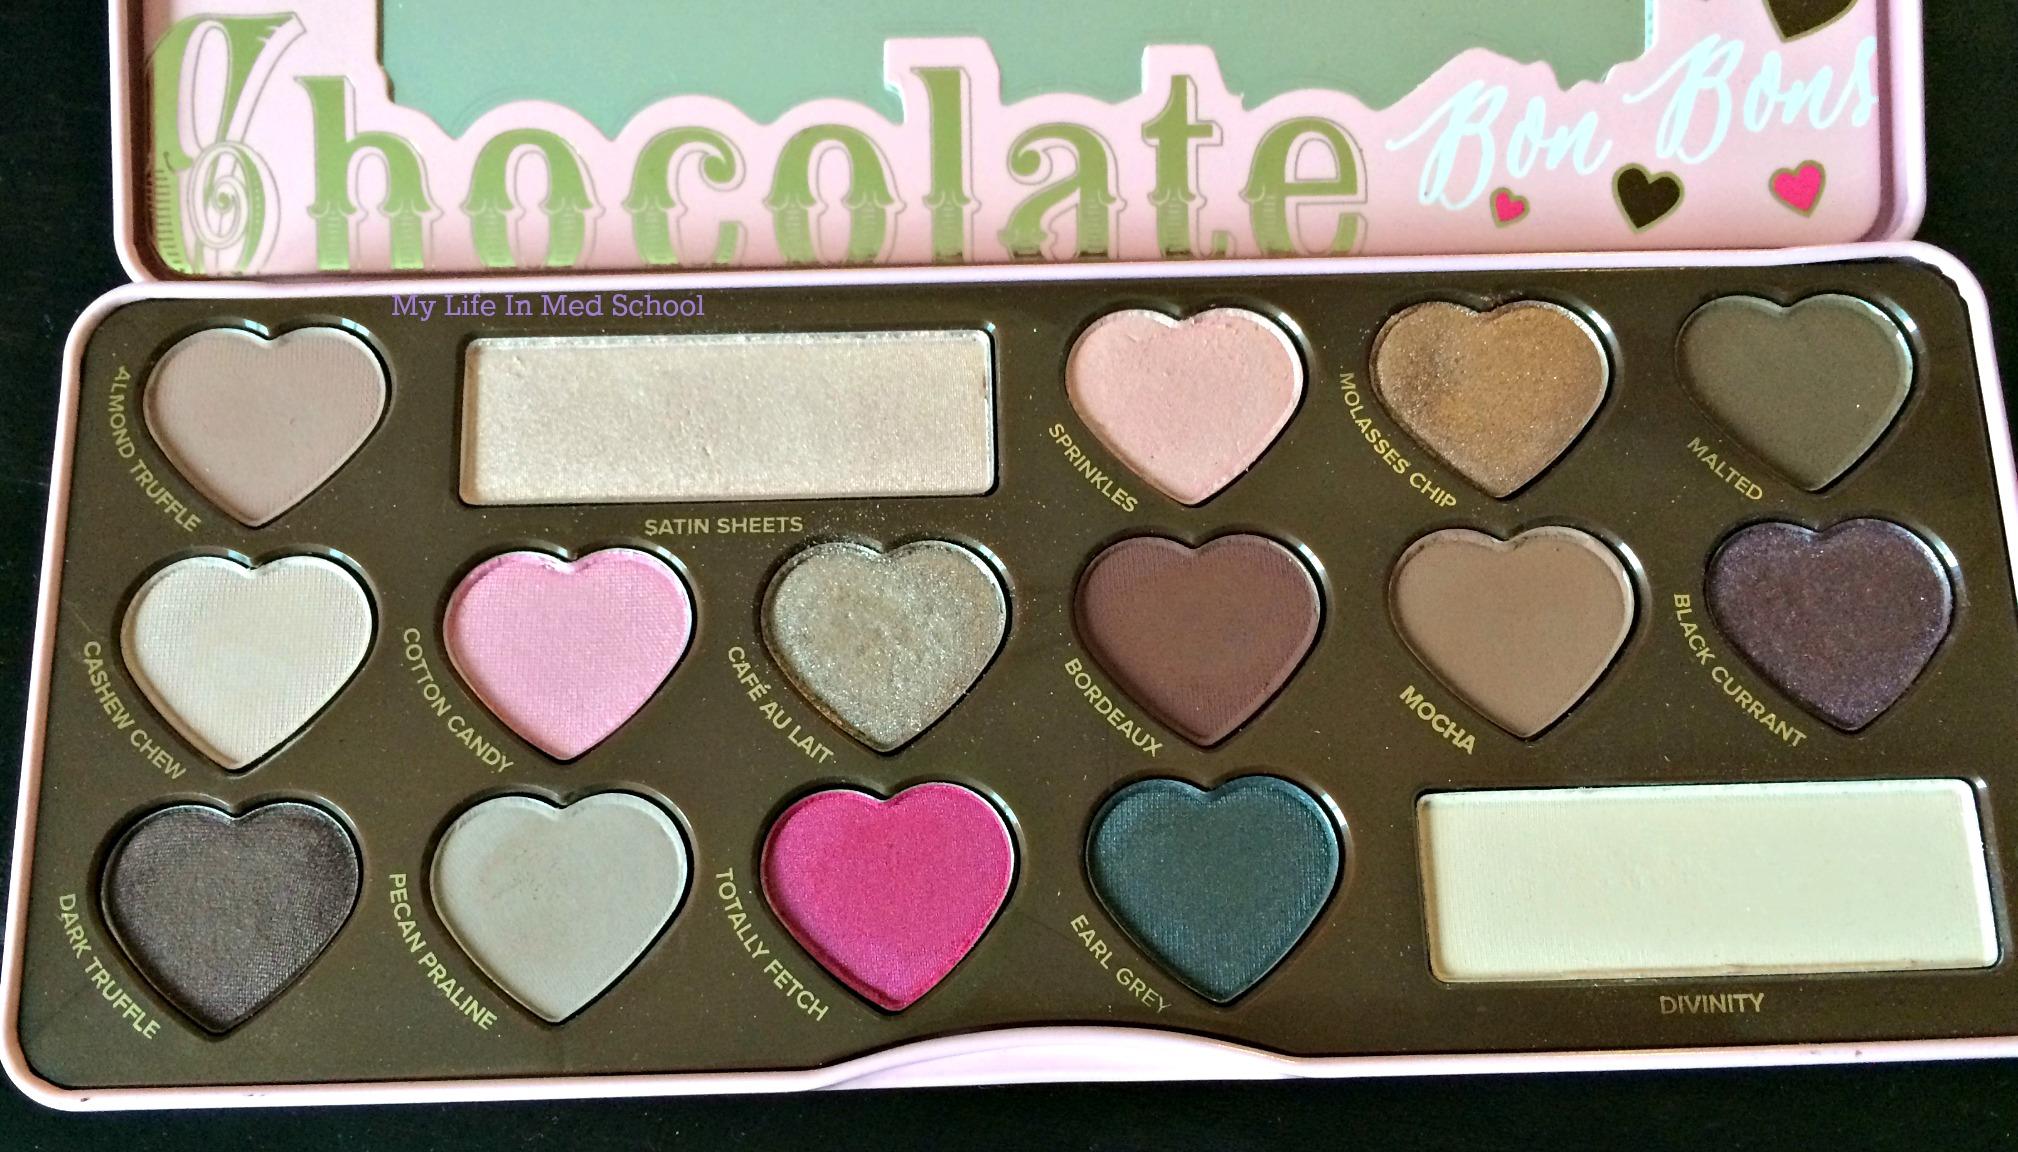 Chocolate Bon Bons Palette